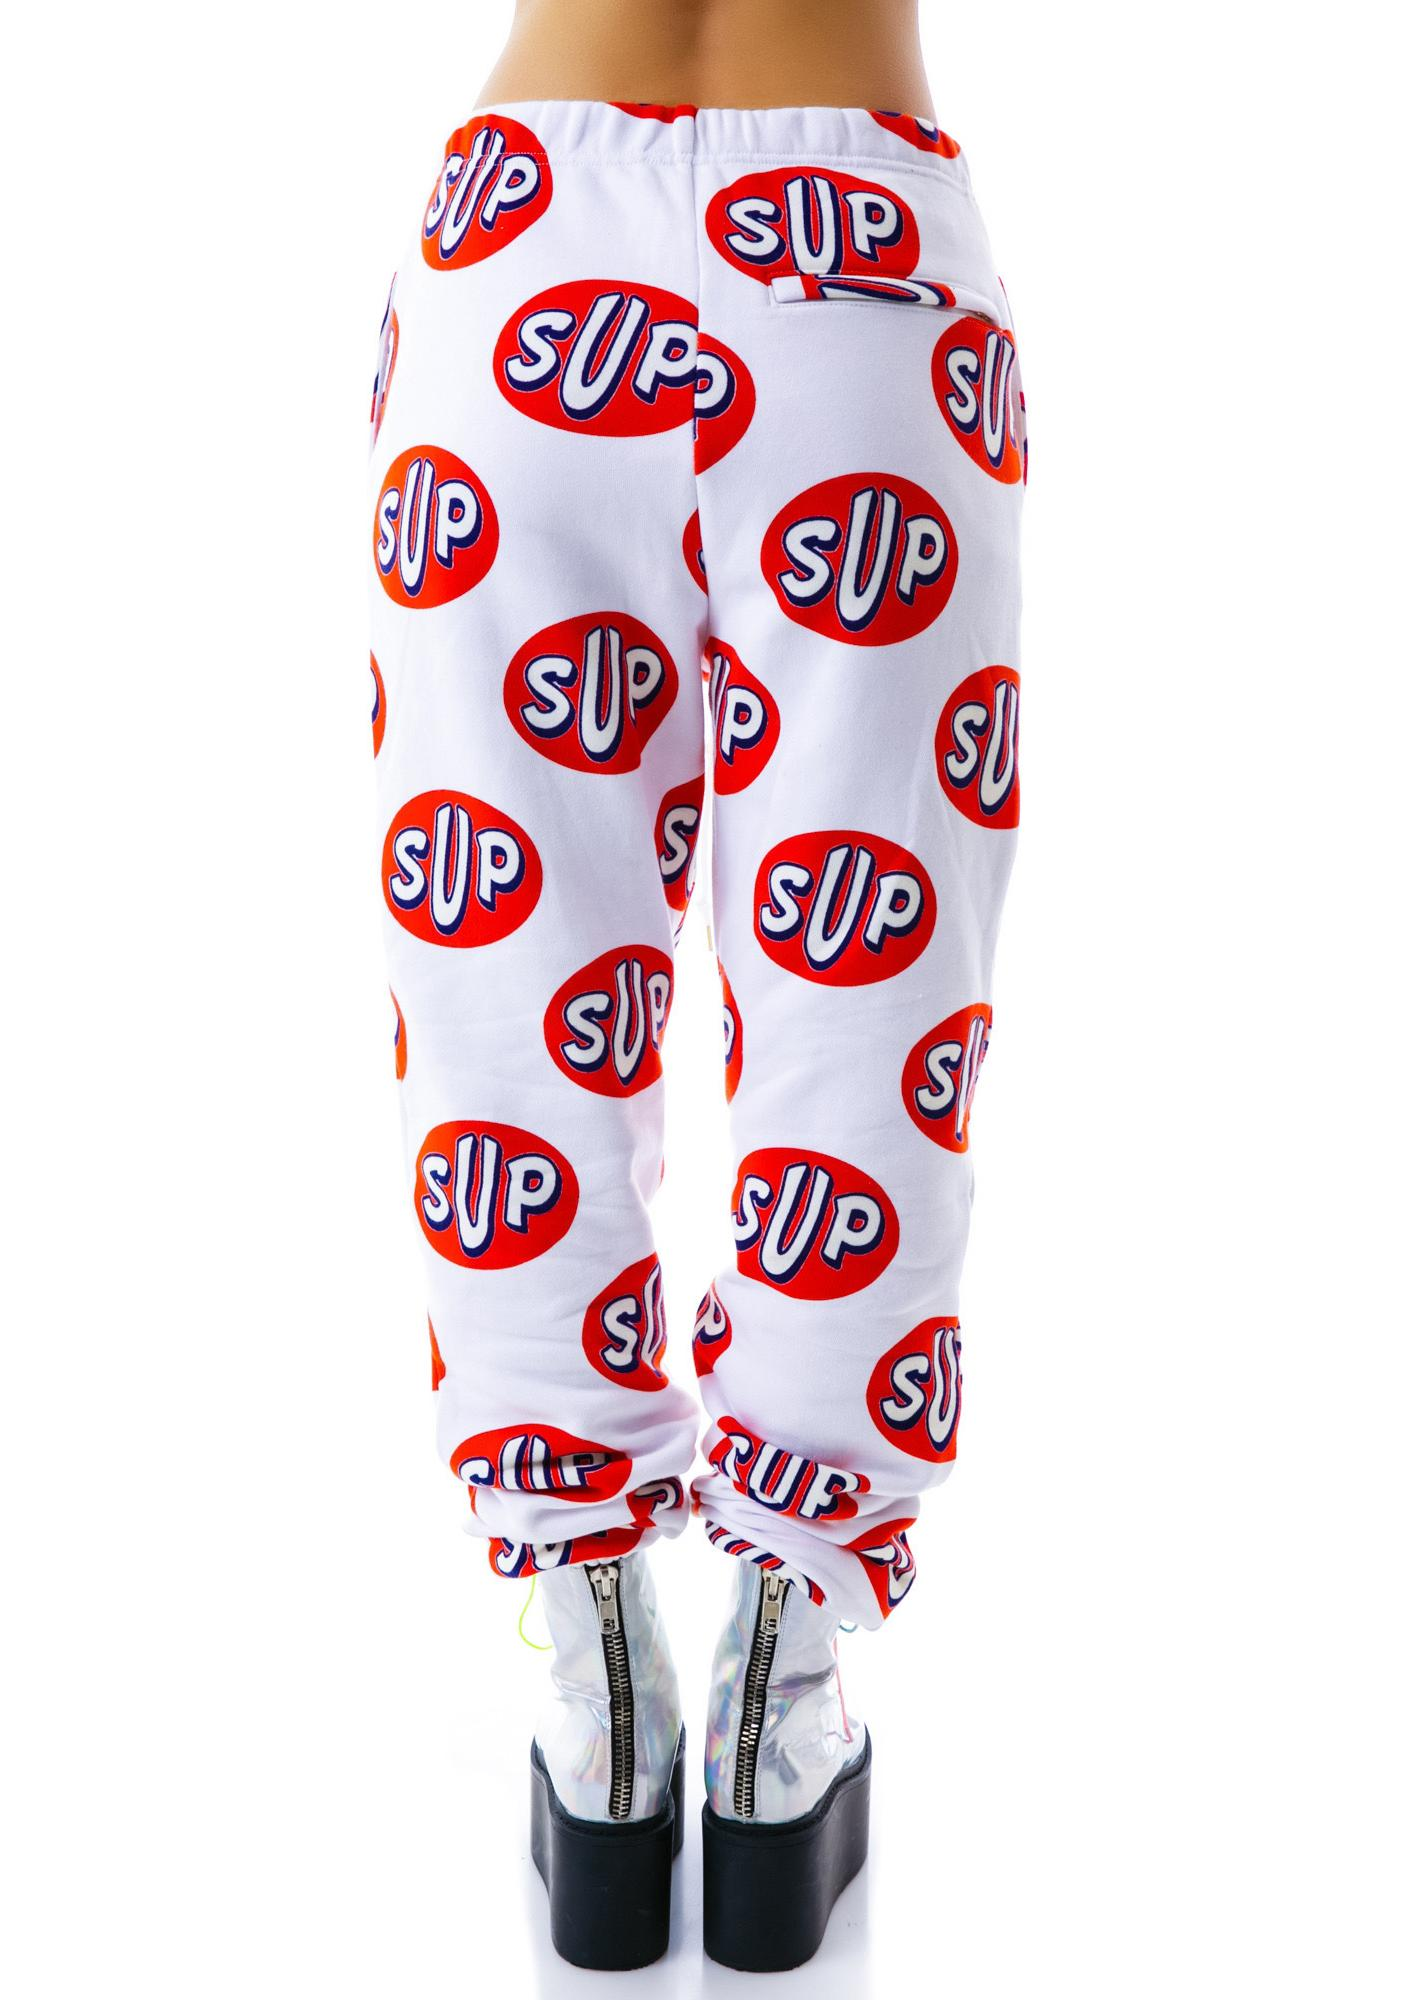 Joyrich Sup Sweatpants